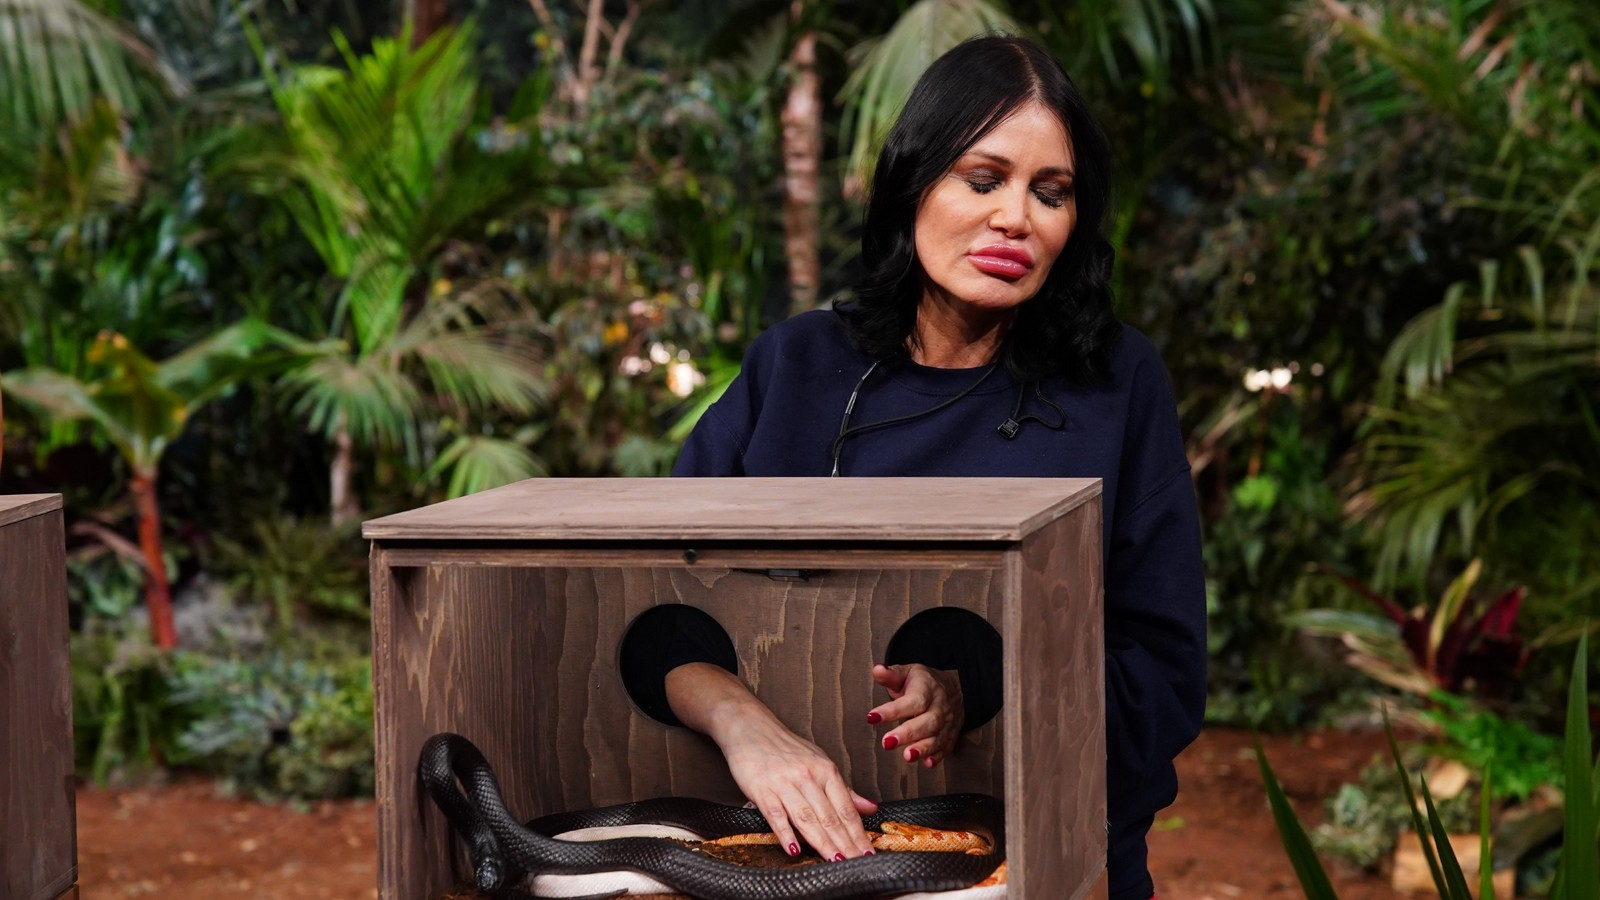 Dschungelshow-Kandidatin Djamila Rowe